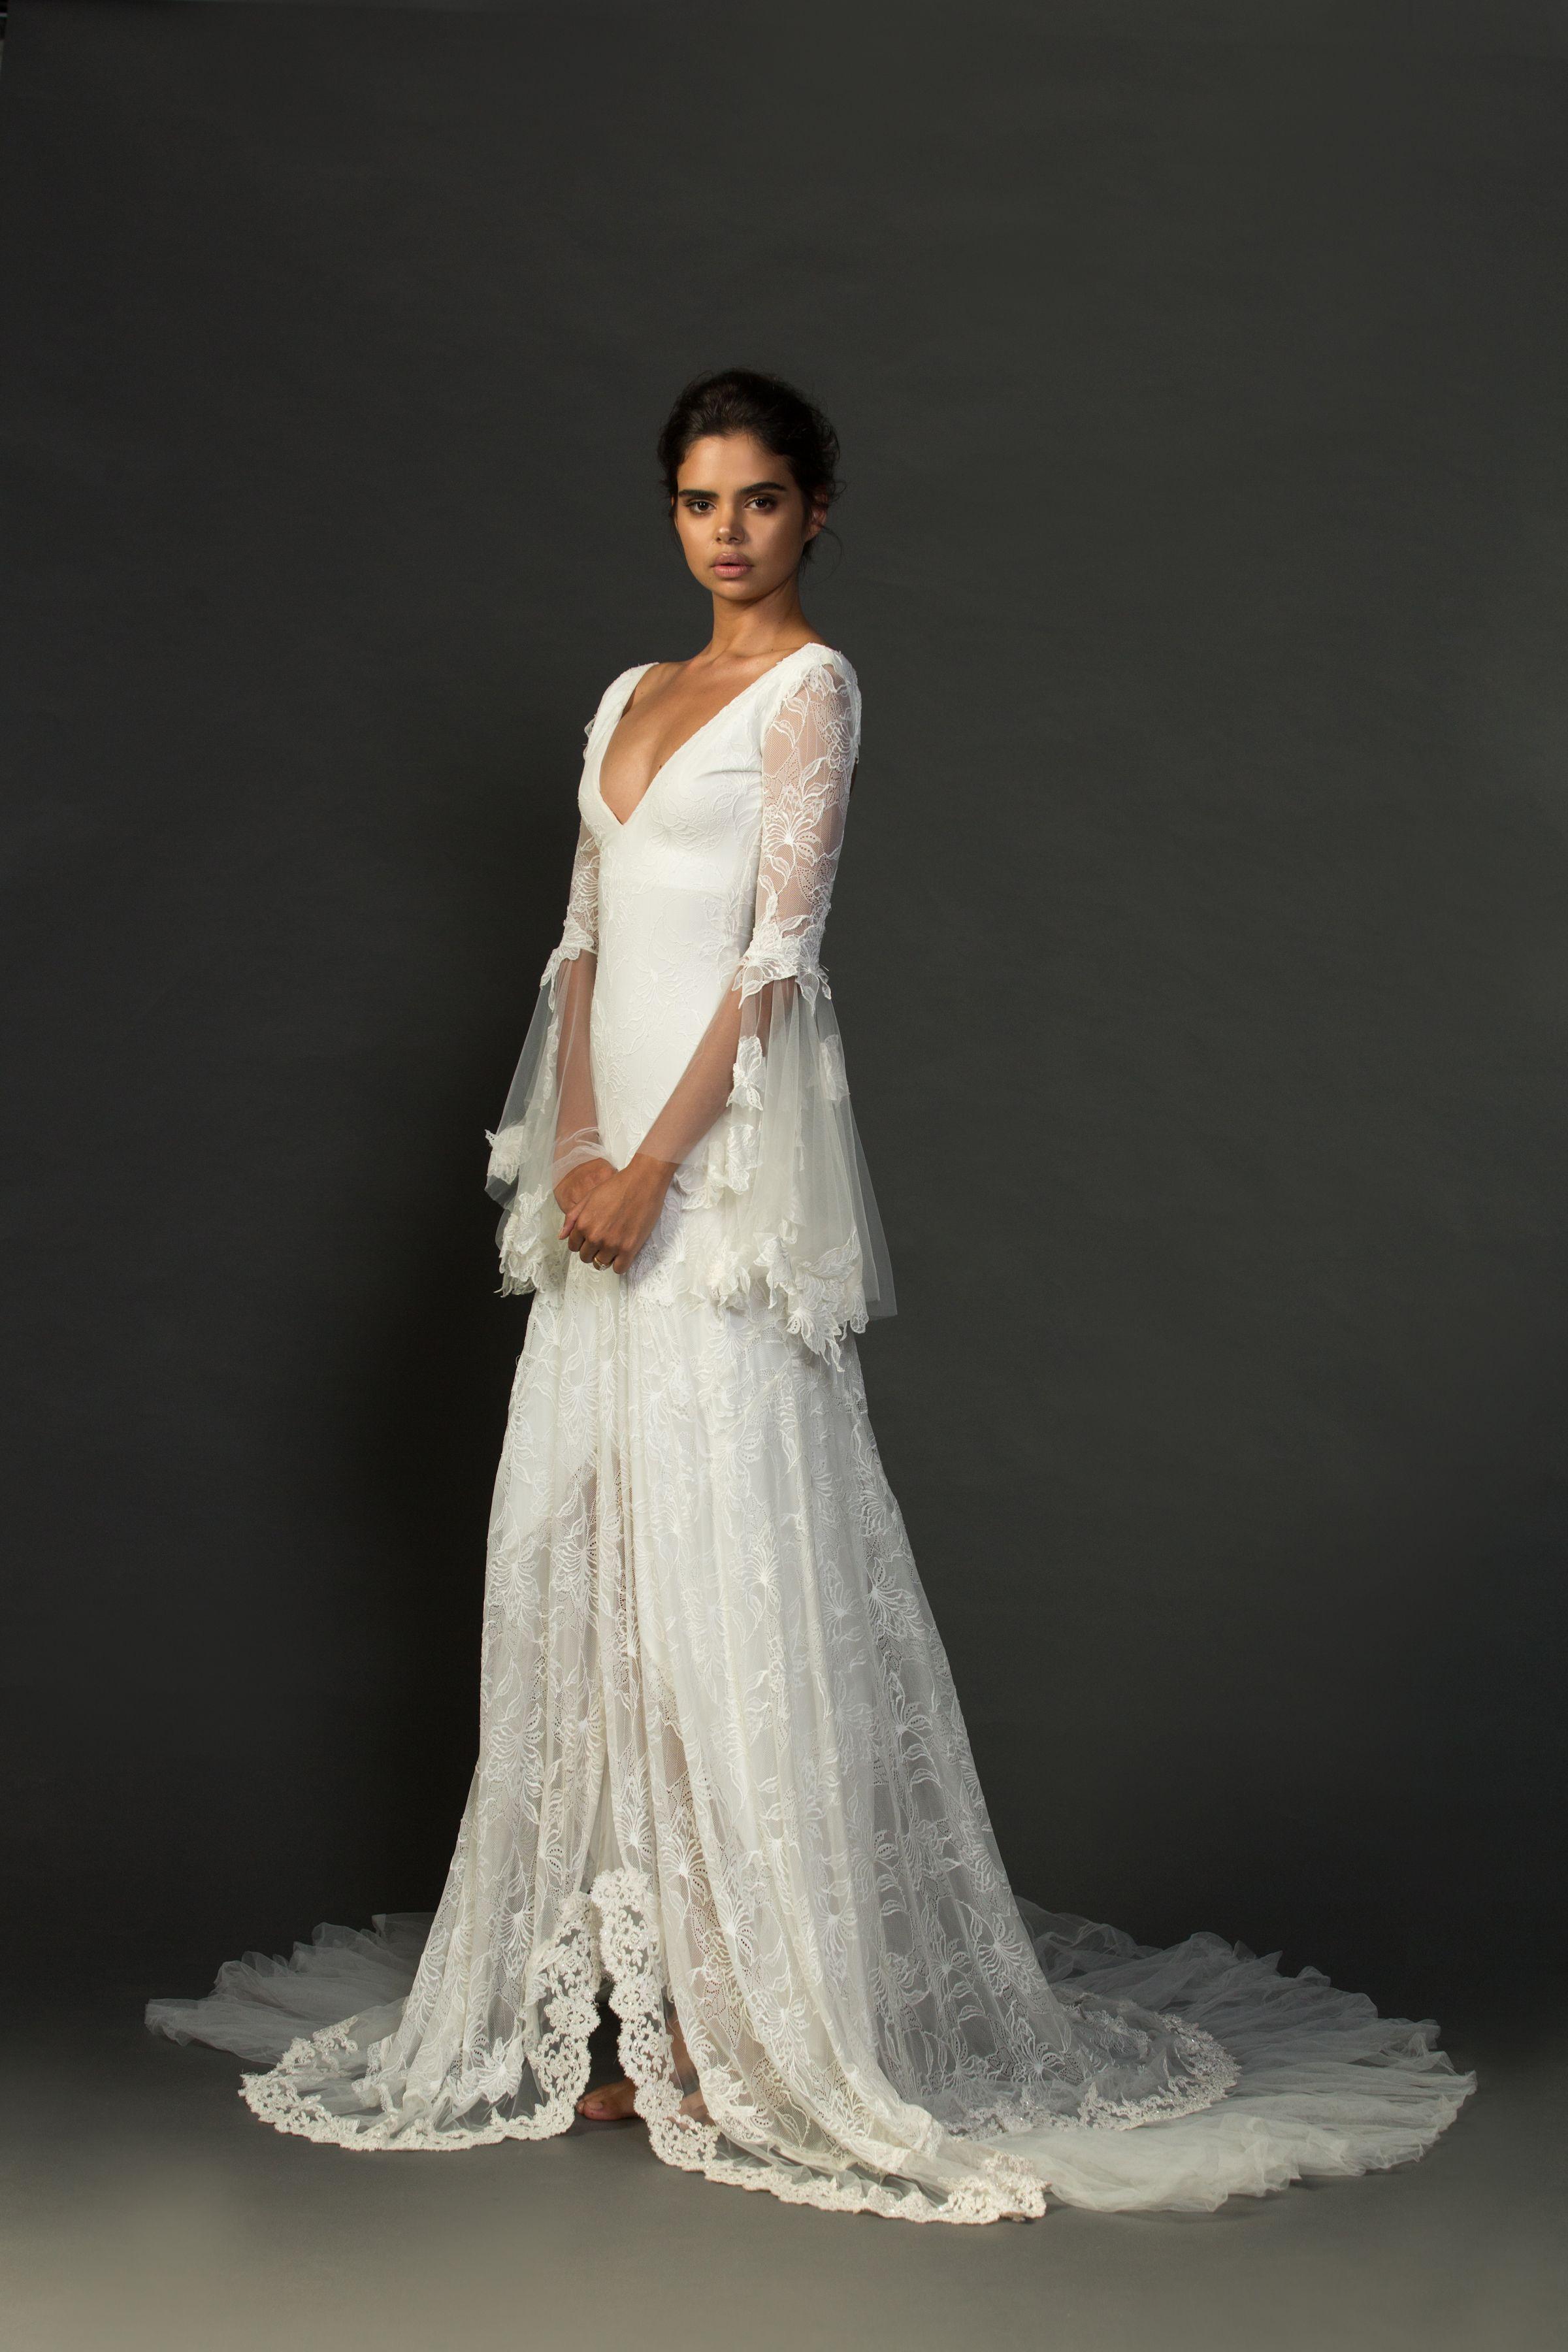 Grace Loves Lace Bridal Collection   Pinterest   Bridal collection ...